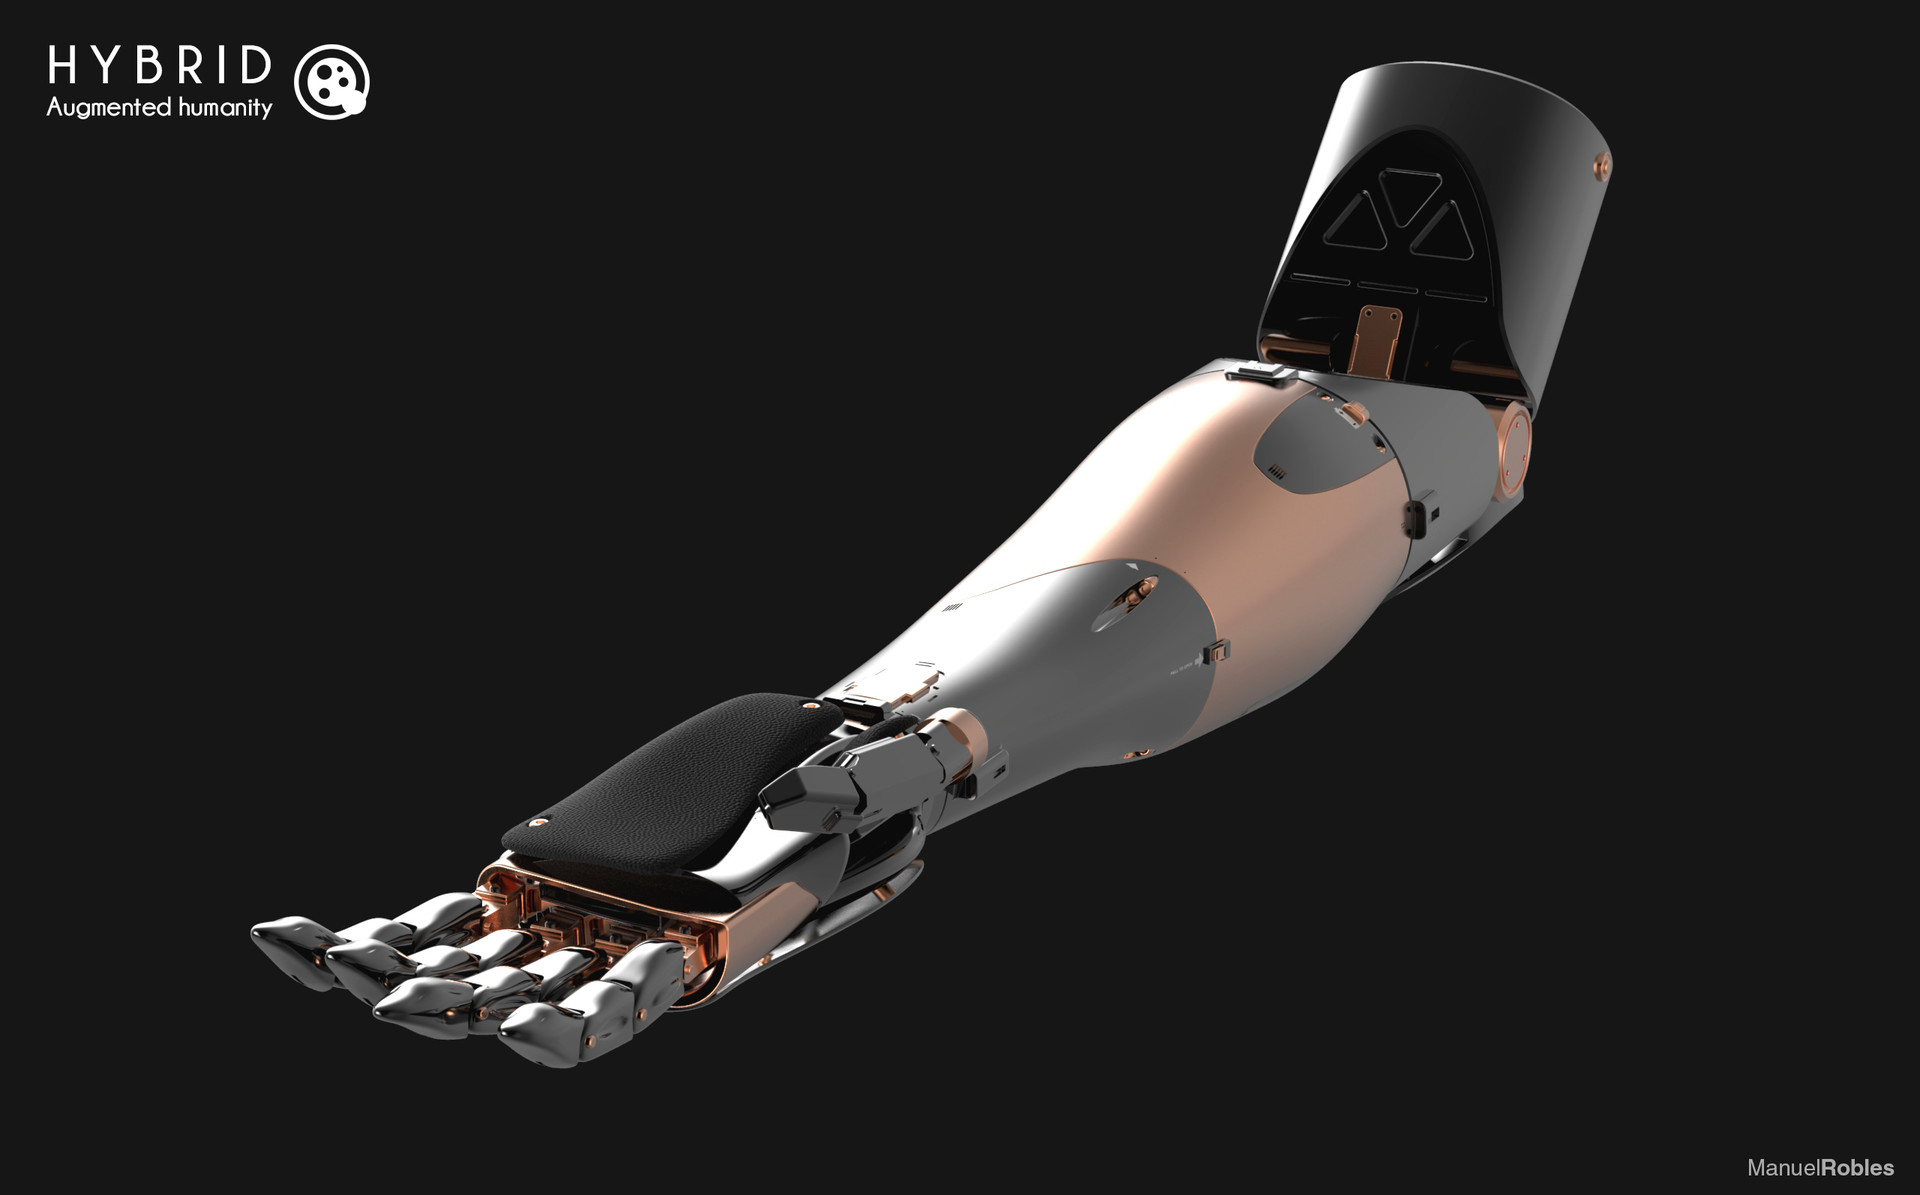 Manuel robles robot arm keyshot 11